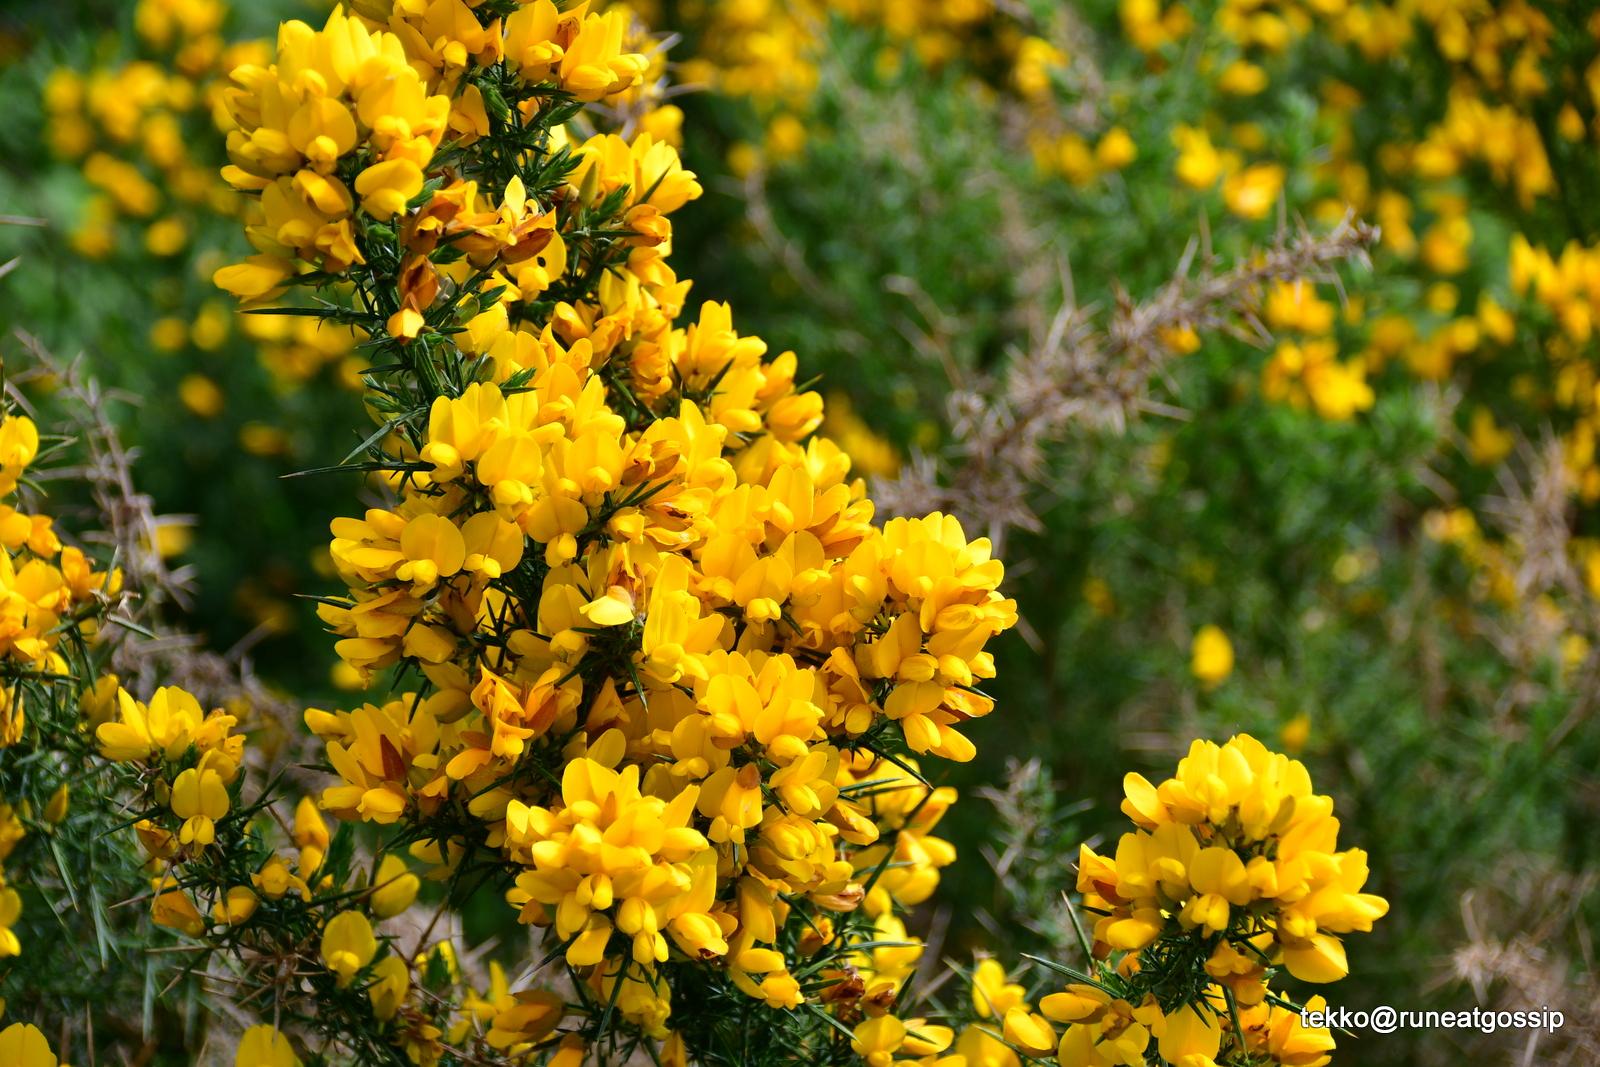 Gorse The Yellow Flower Of Scotland Runeatgossip